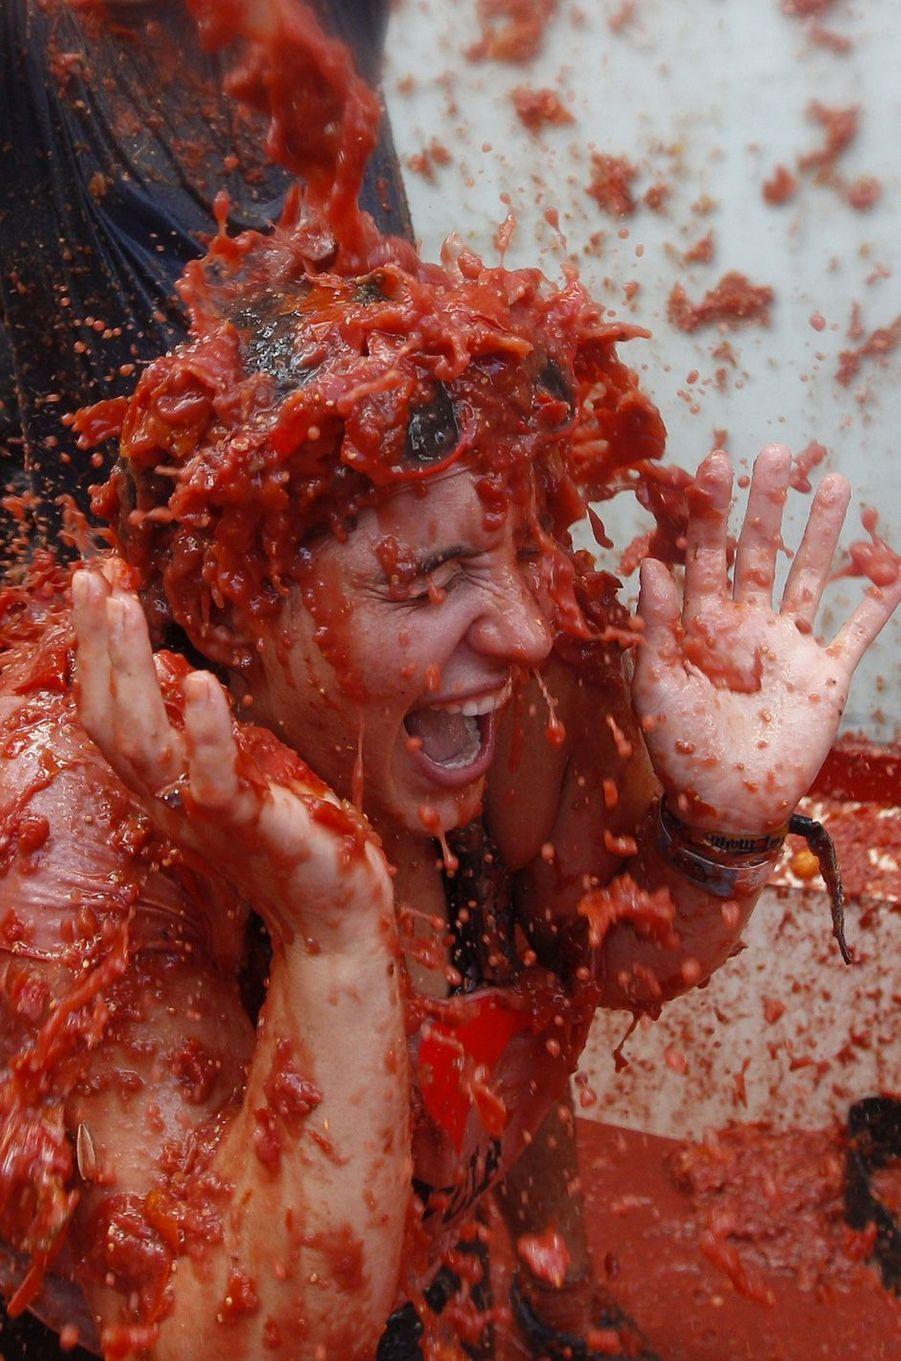 Le festival de la Tomatina a eu lieu ce mercredi 31 août àBuñol, près de Valence.